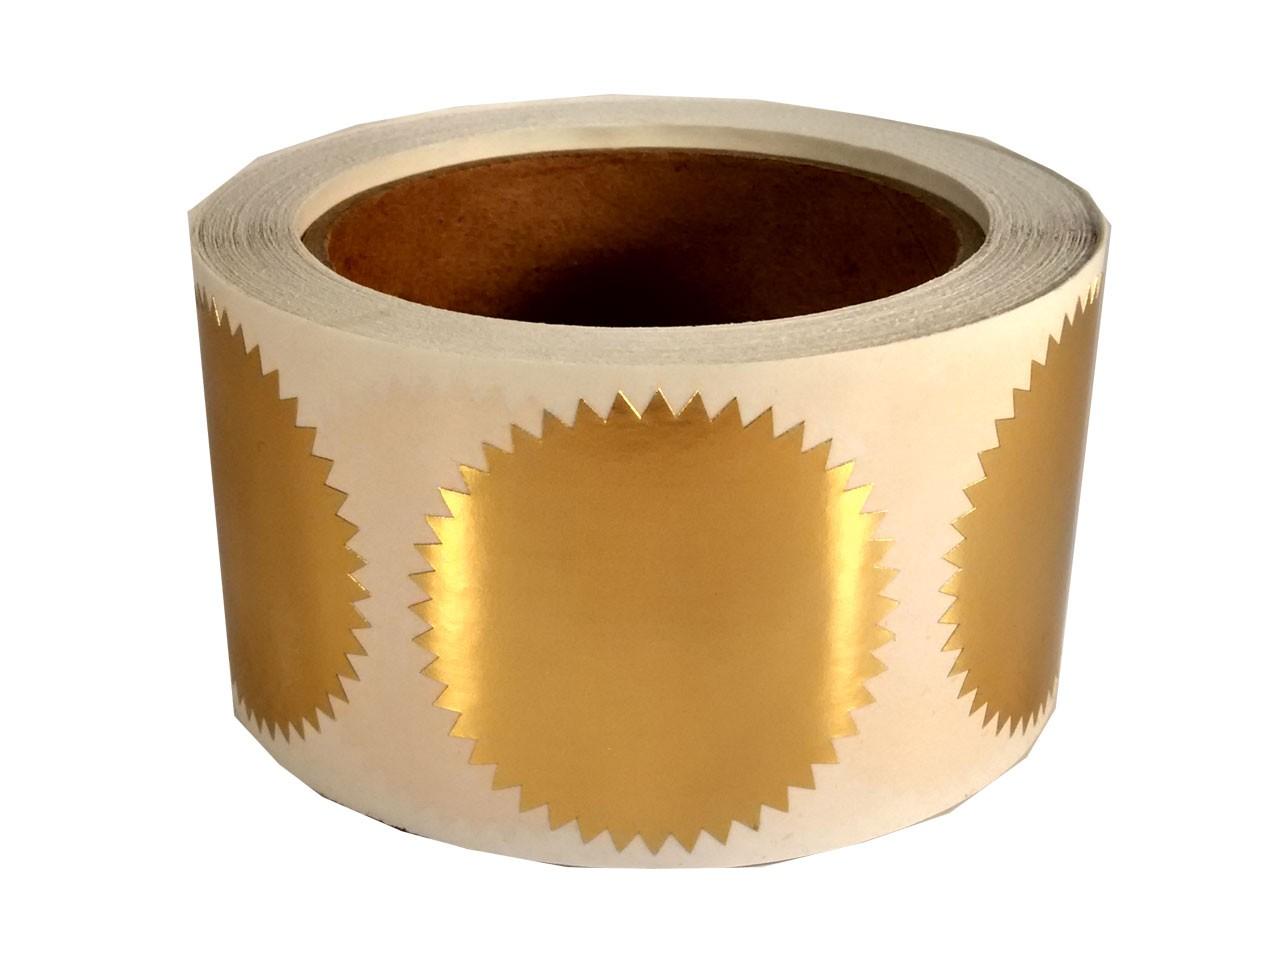 Self-adhesive Seal Gold (500)